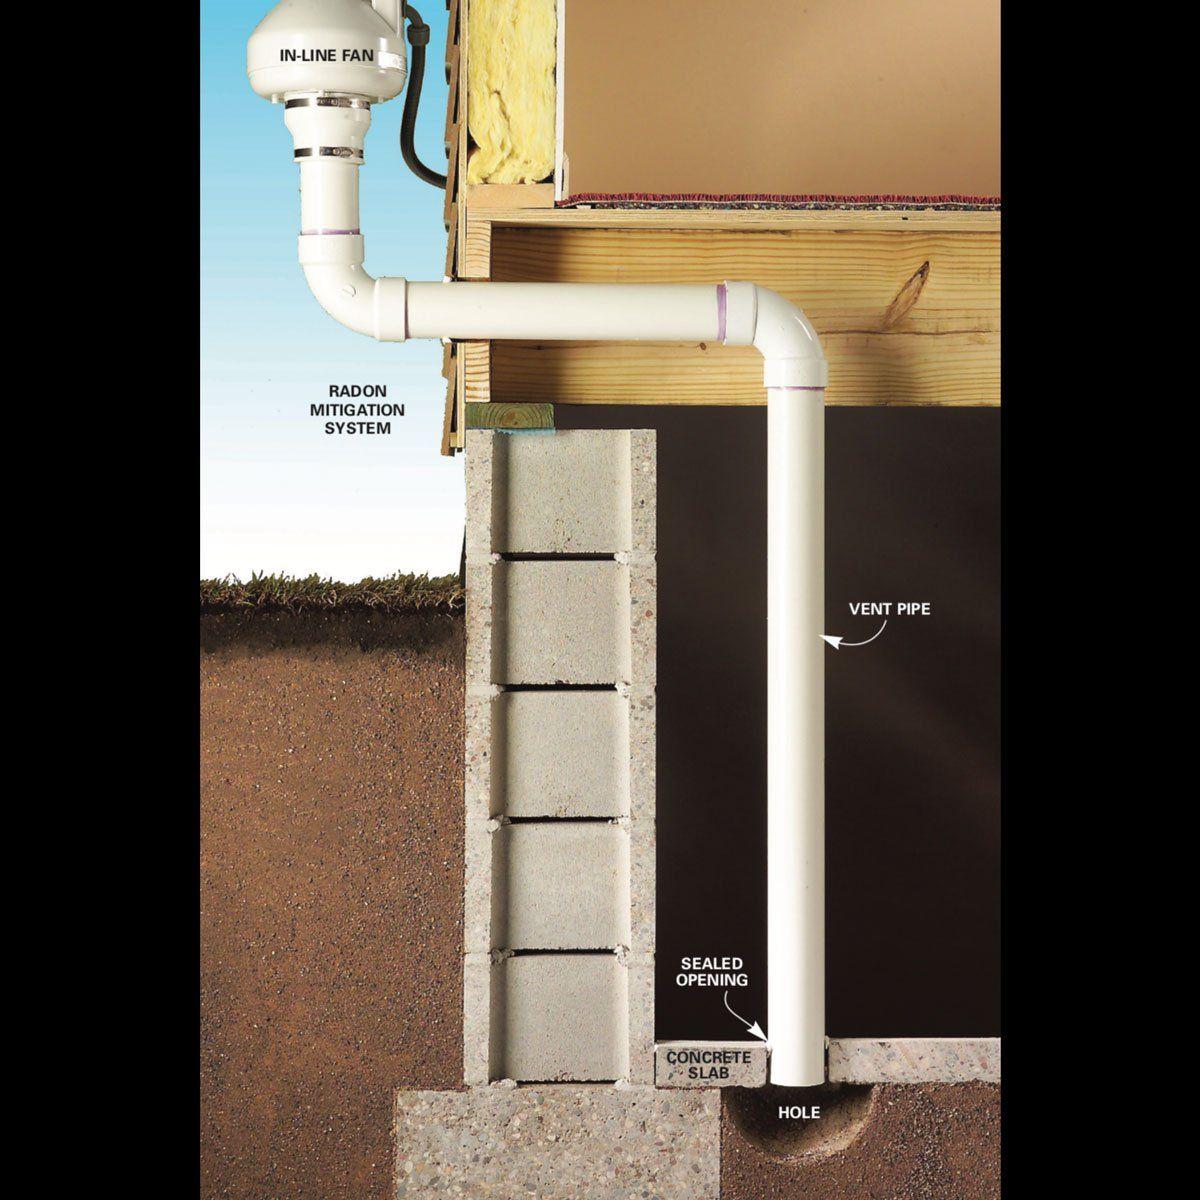 Radon Gas Remediation The Best Radon Mitigation Systems Radon Mitigation Radon Gas Radon